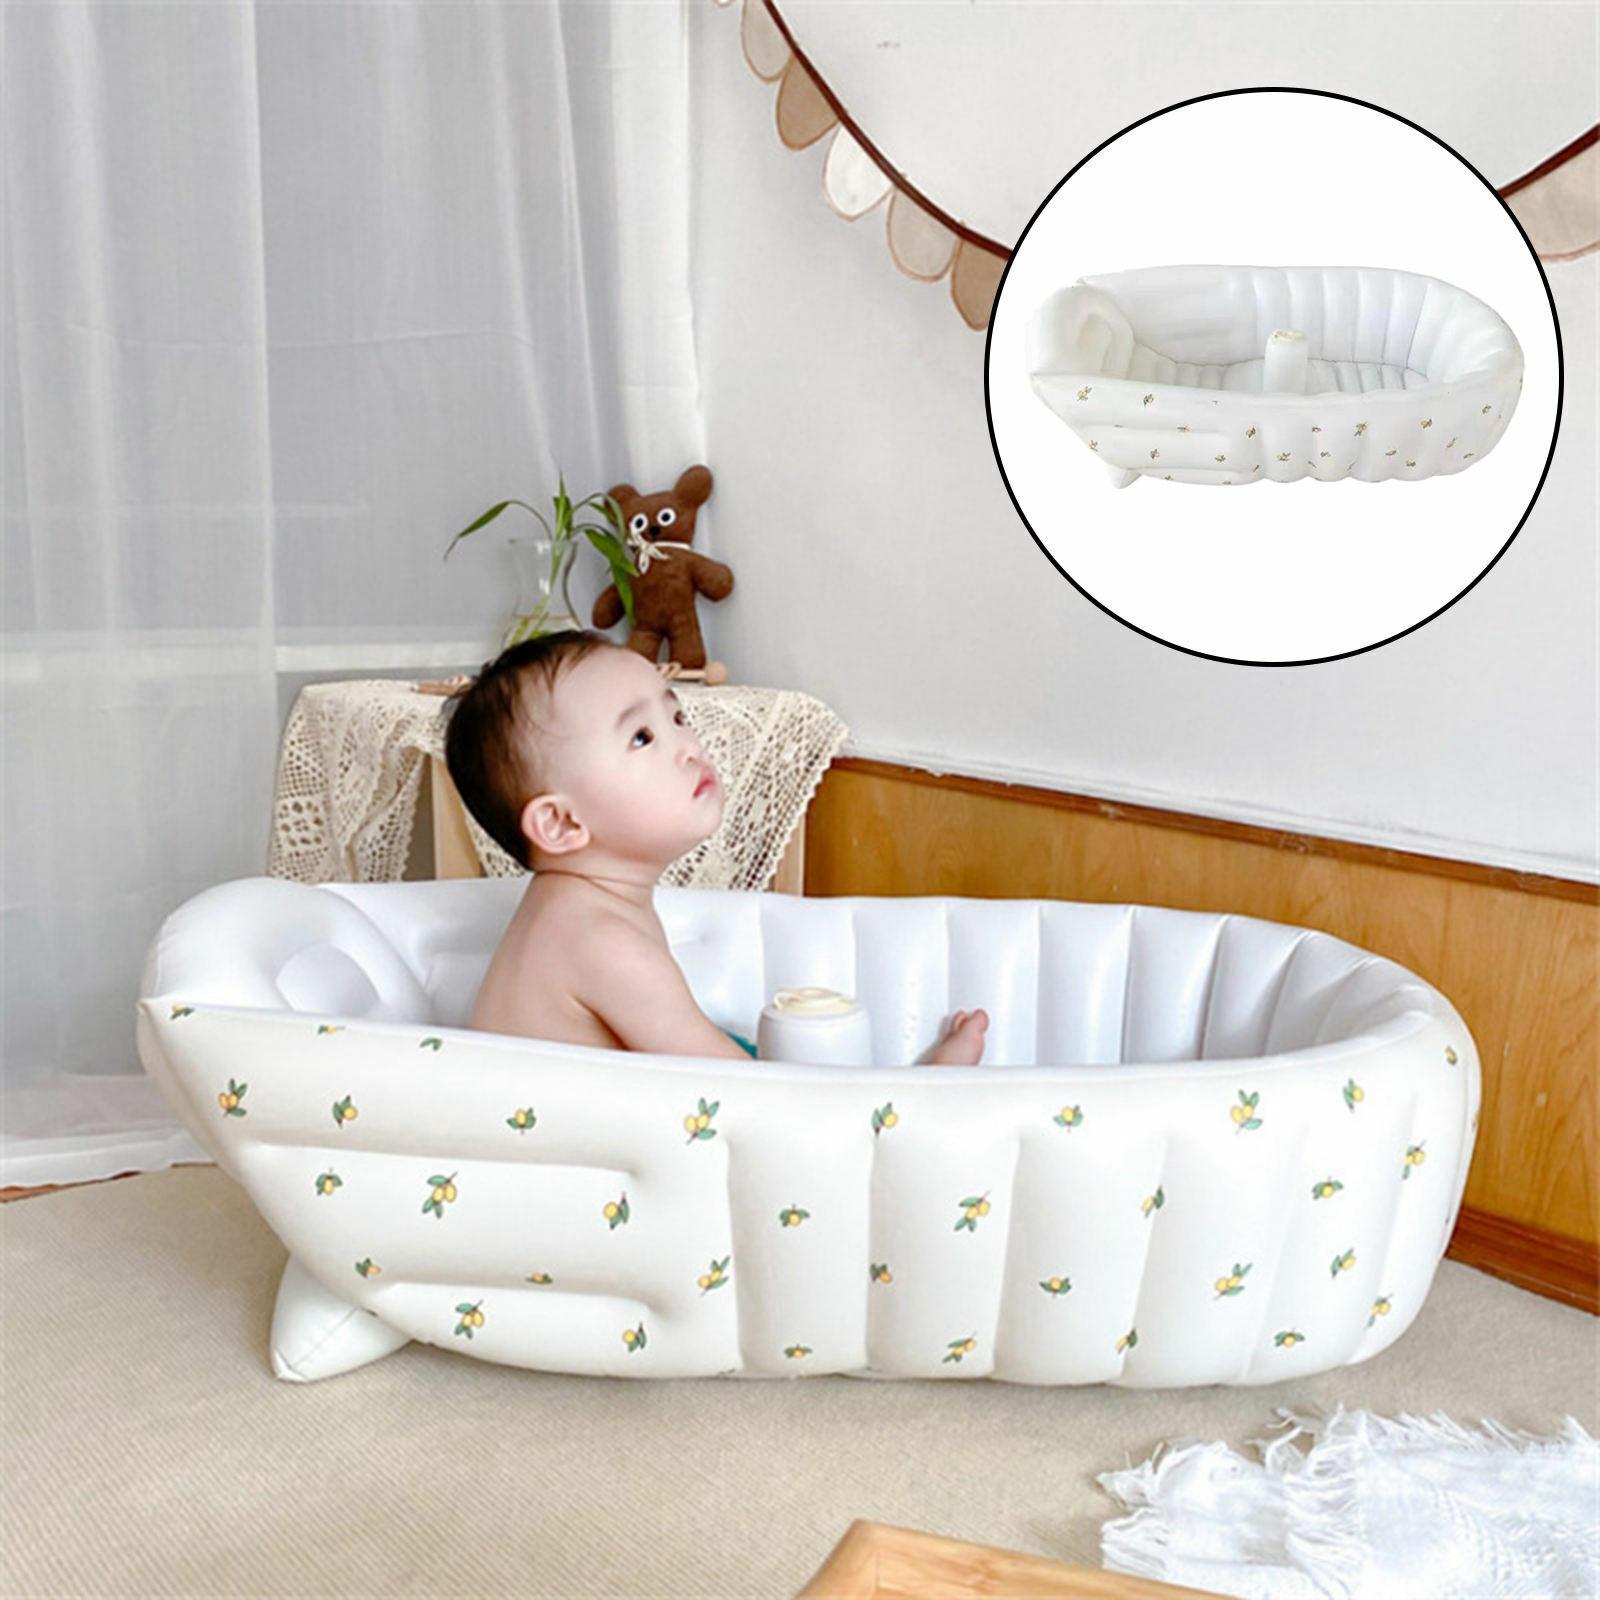 Inflatable Bathtub Slip Resistant Raised Section Gift Shower Tool for Family